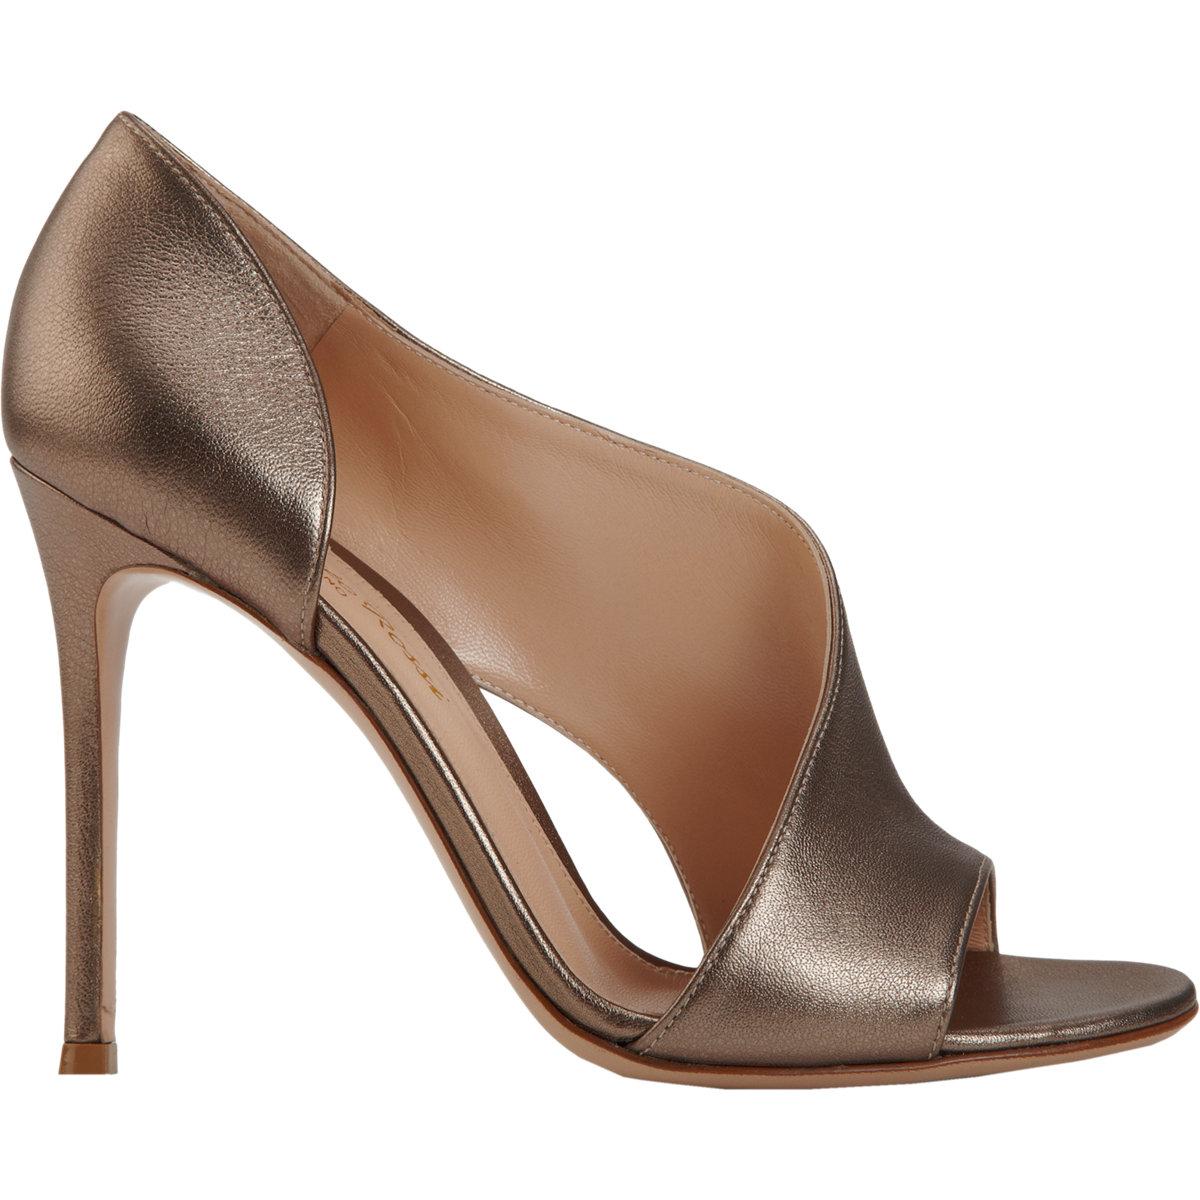 Gianvito Rossi Asymmetric Glitter Sandals Fvha212